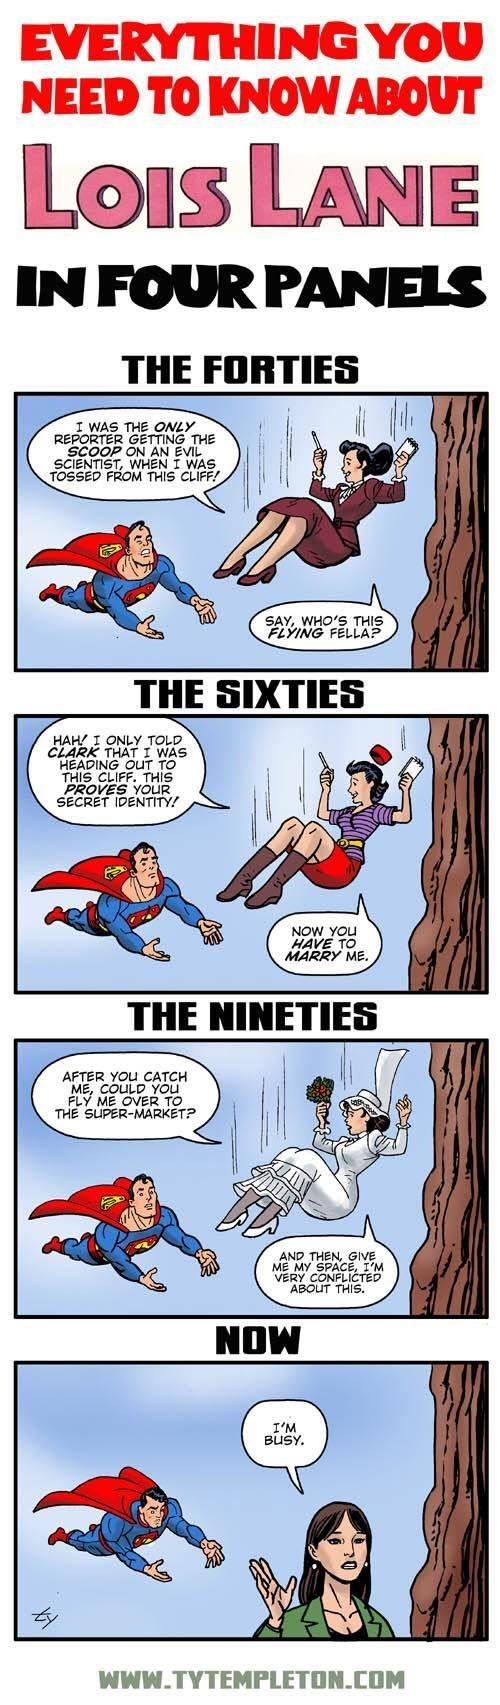 lois lane superman web comics - 8265252096